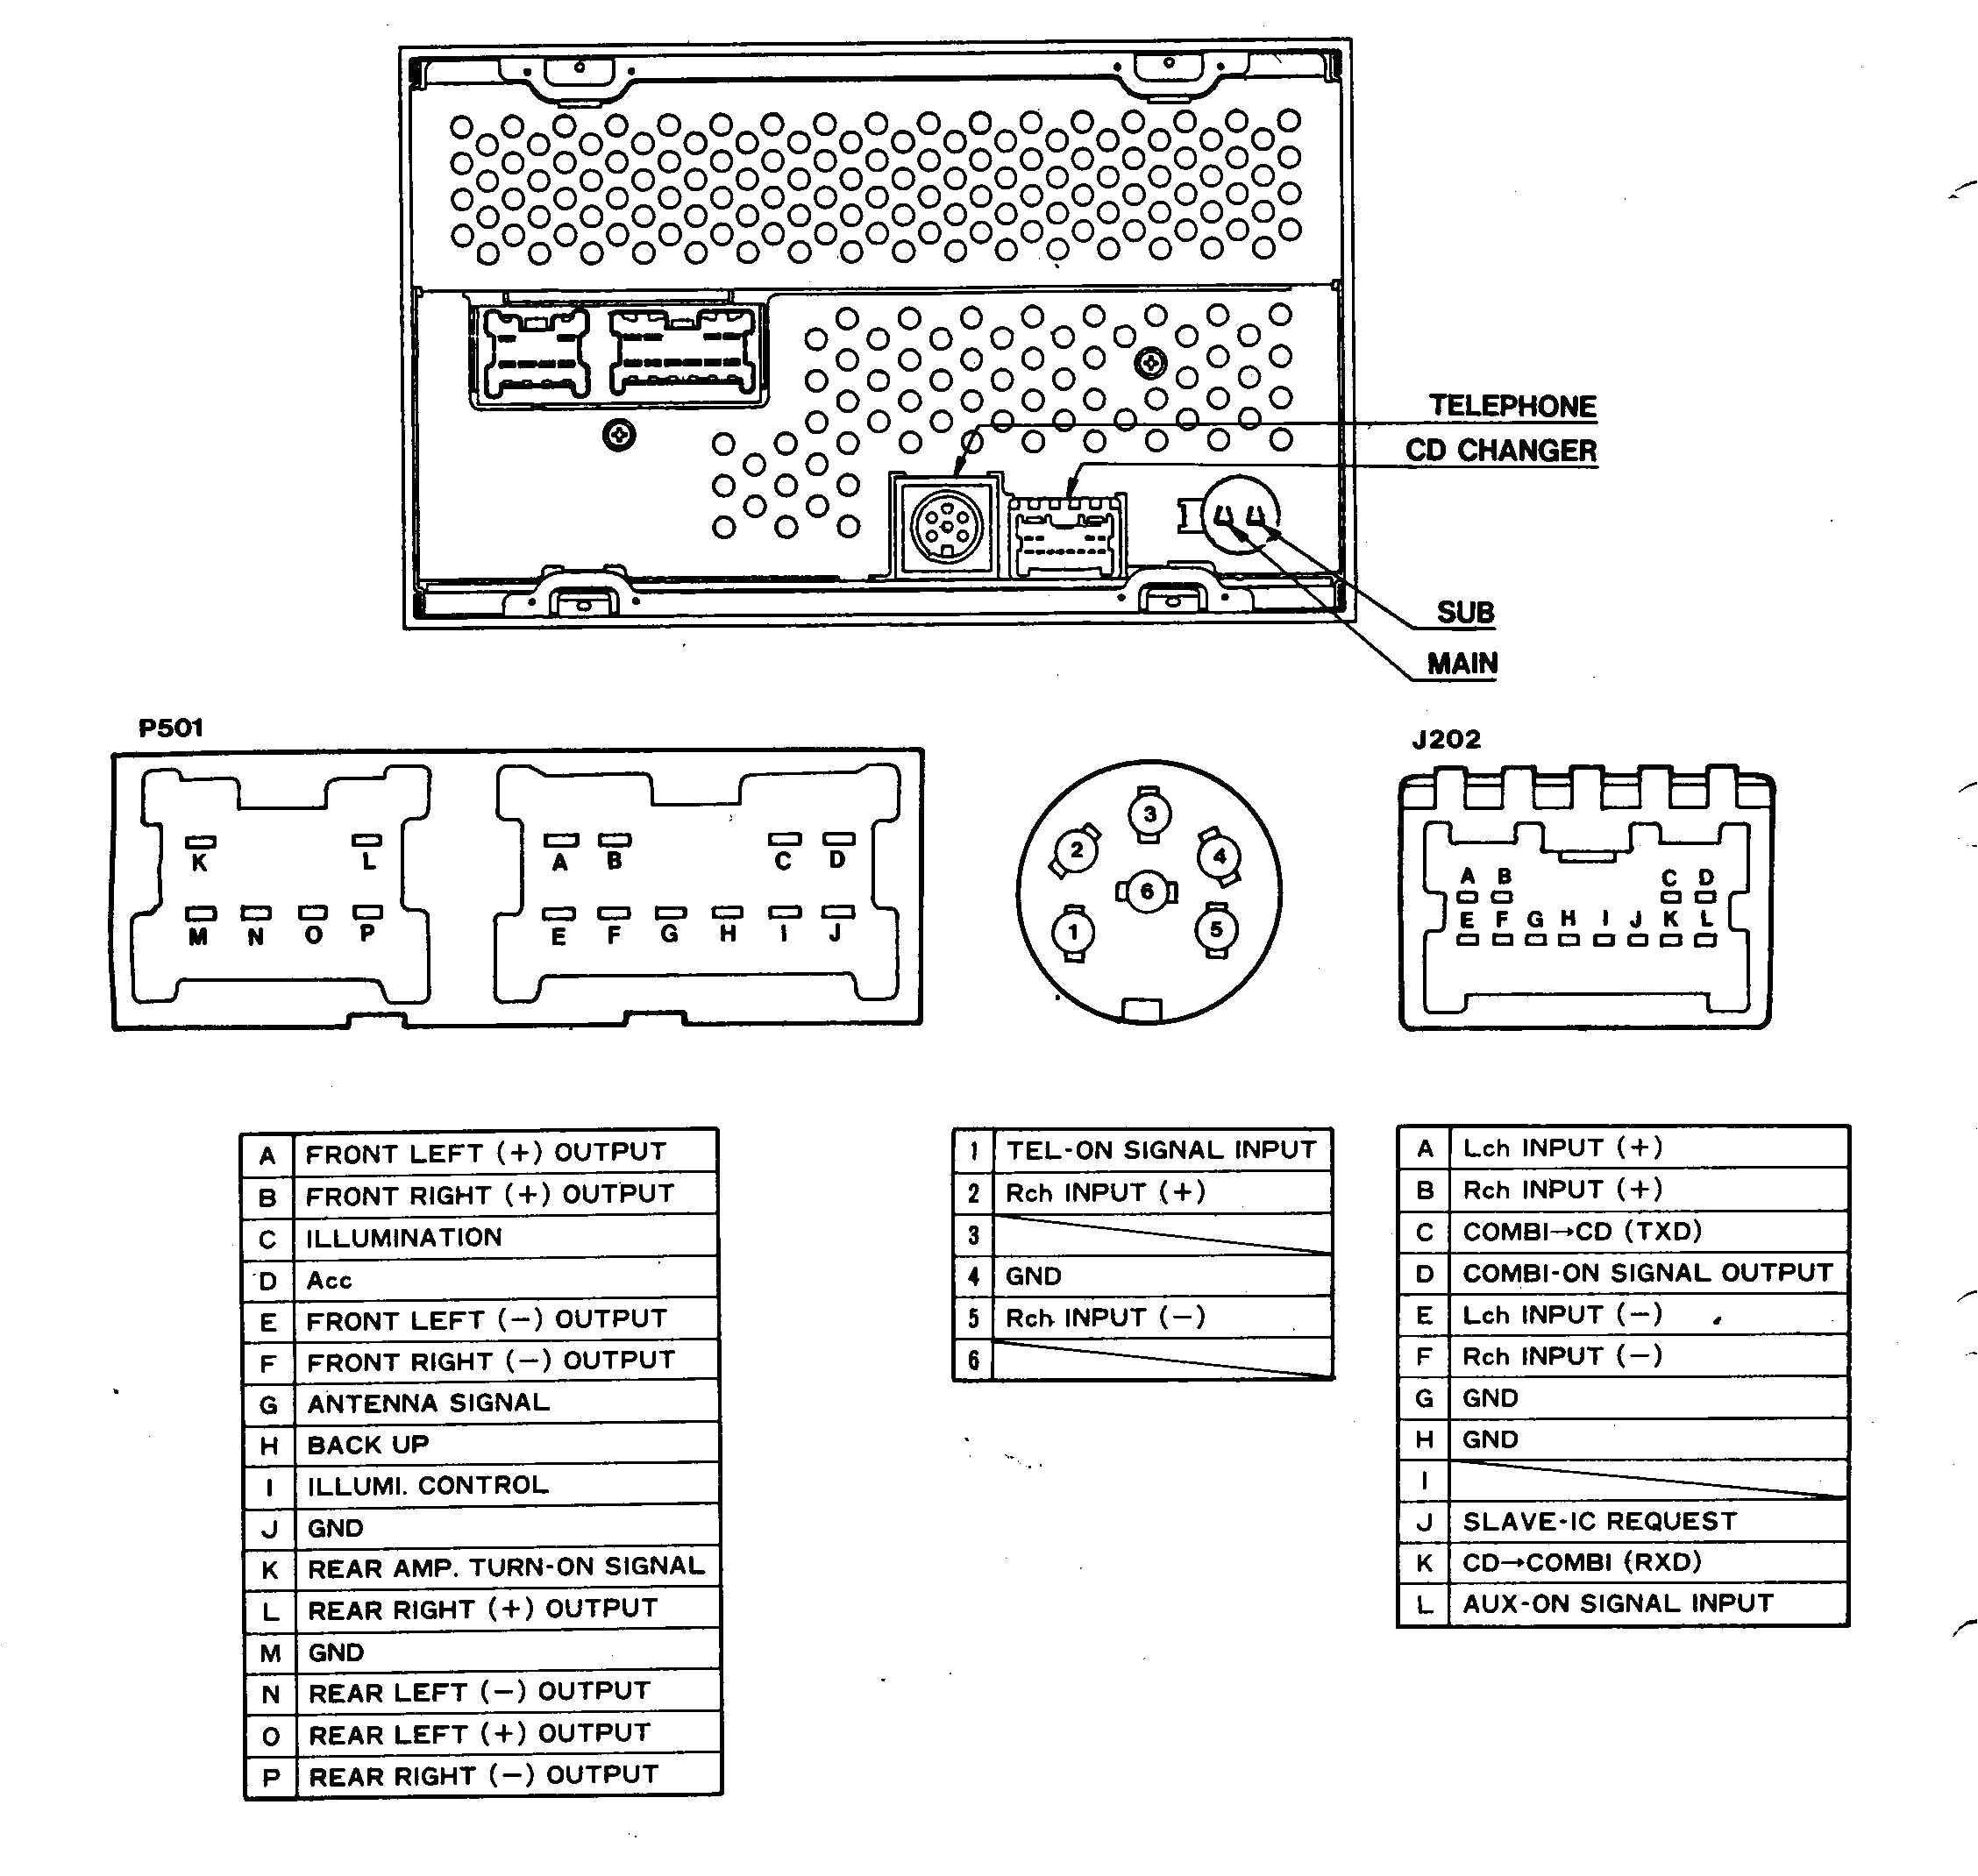 1995 nissan maxima radio wiring diagram simplified shapes nissan micra indicator wiring diagram diagrams extraordinary 240sx of 1995 nissan maxima radio wiring diagram jpg